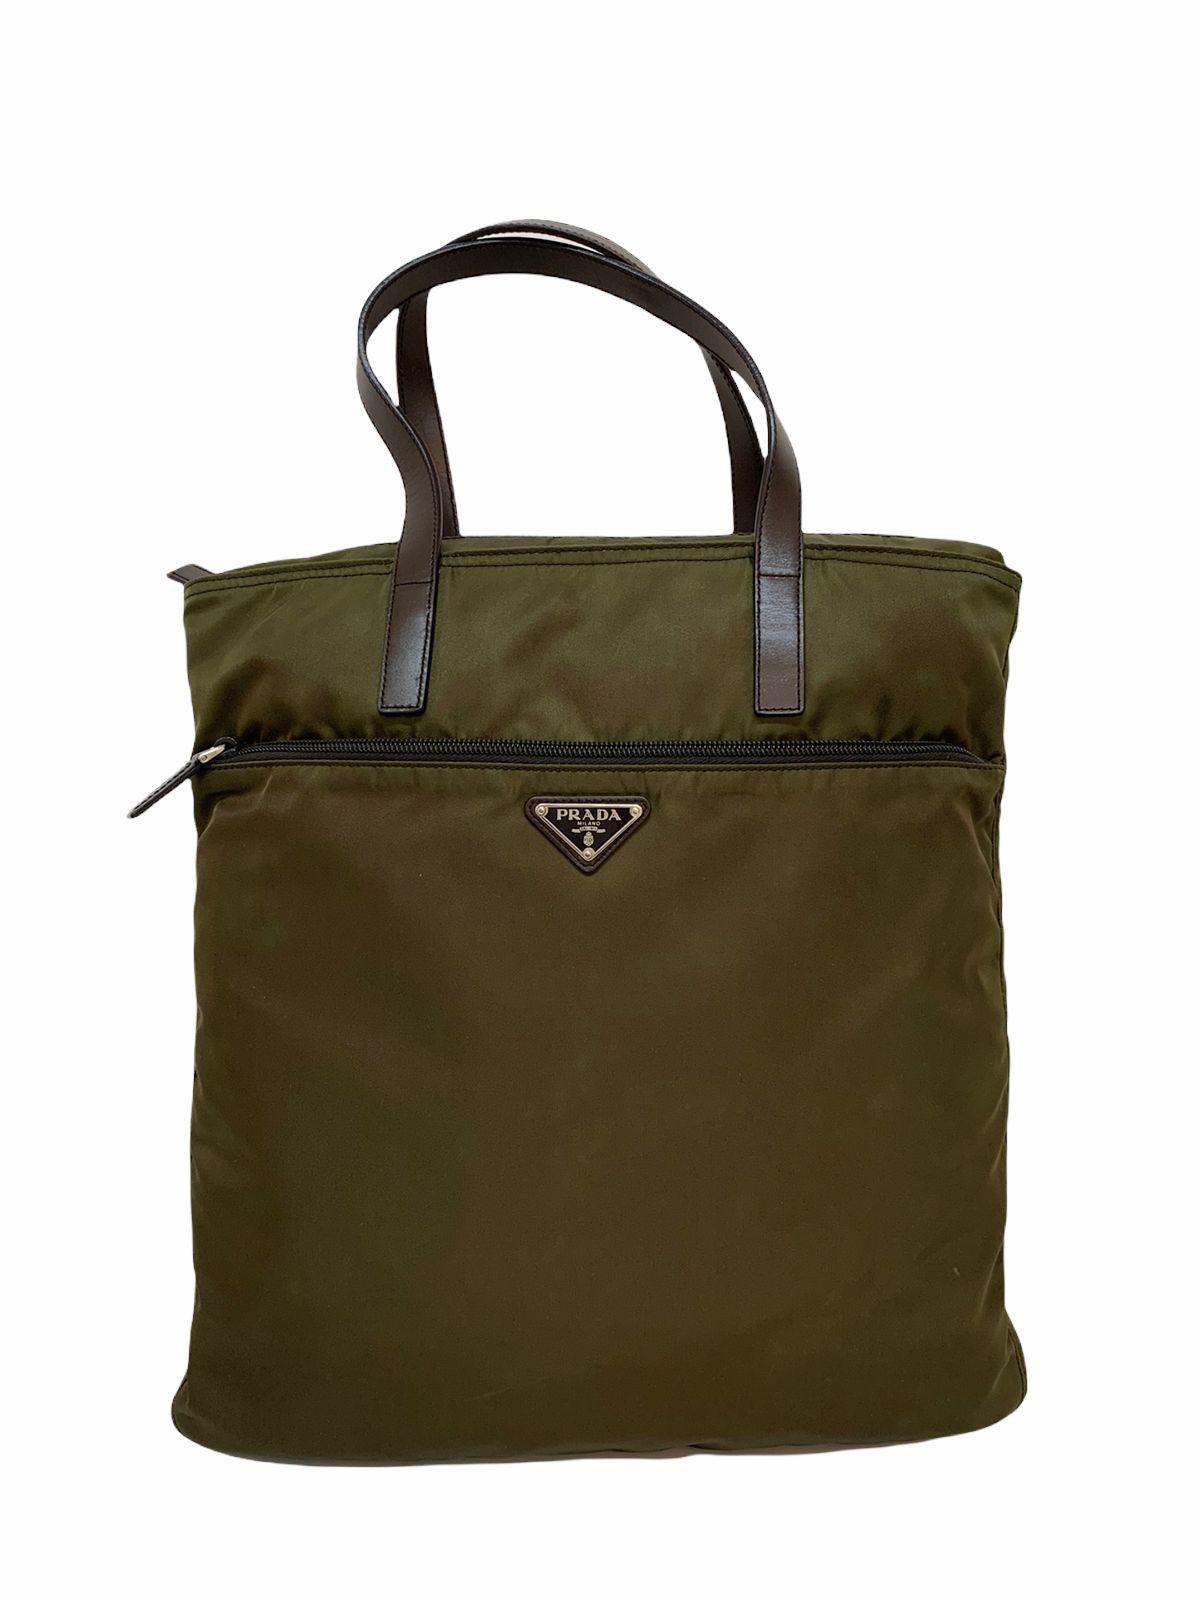 Bolsa Prada Nylon Tote Verde Escuro